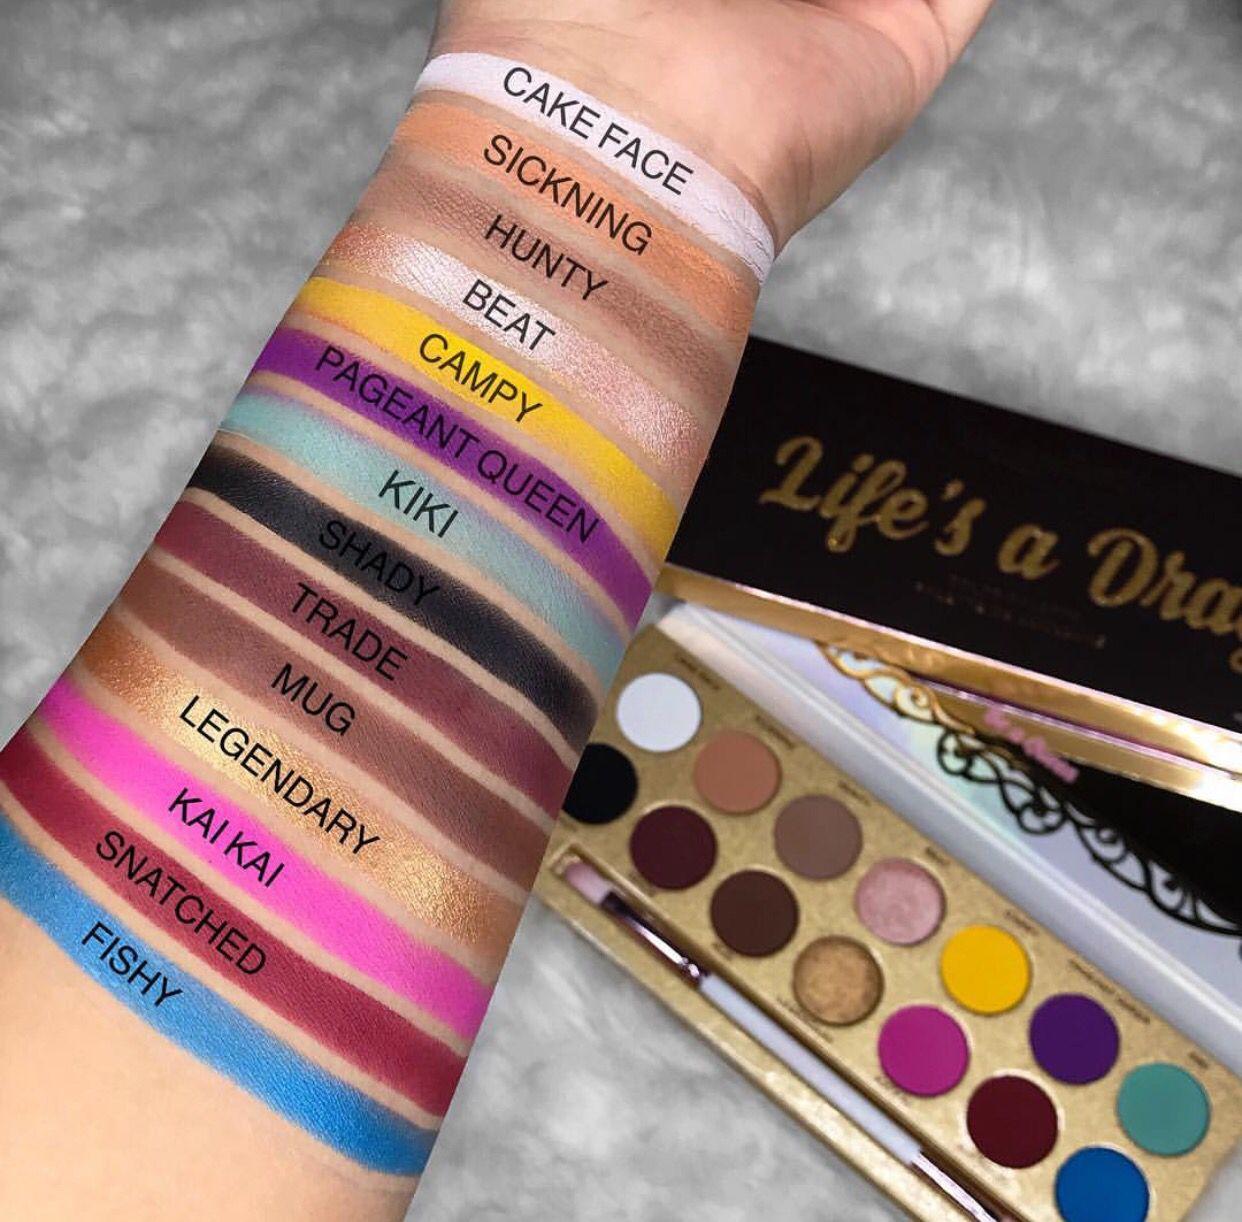 Life's a drag eyeshadow palette Natural eyeshadow